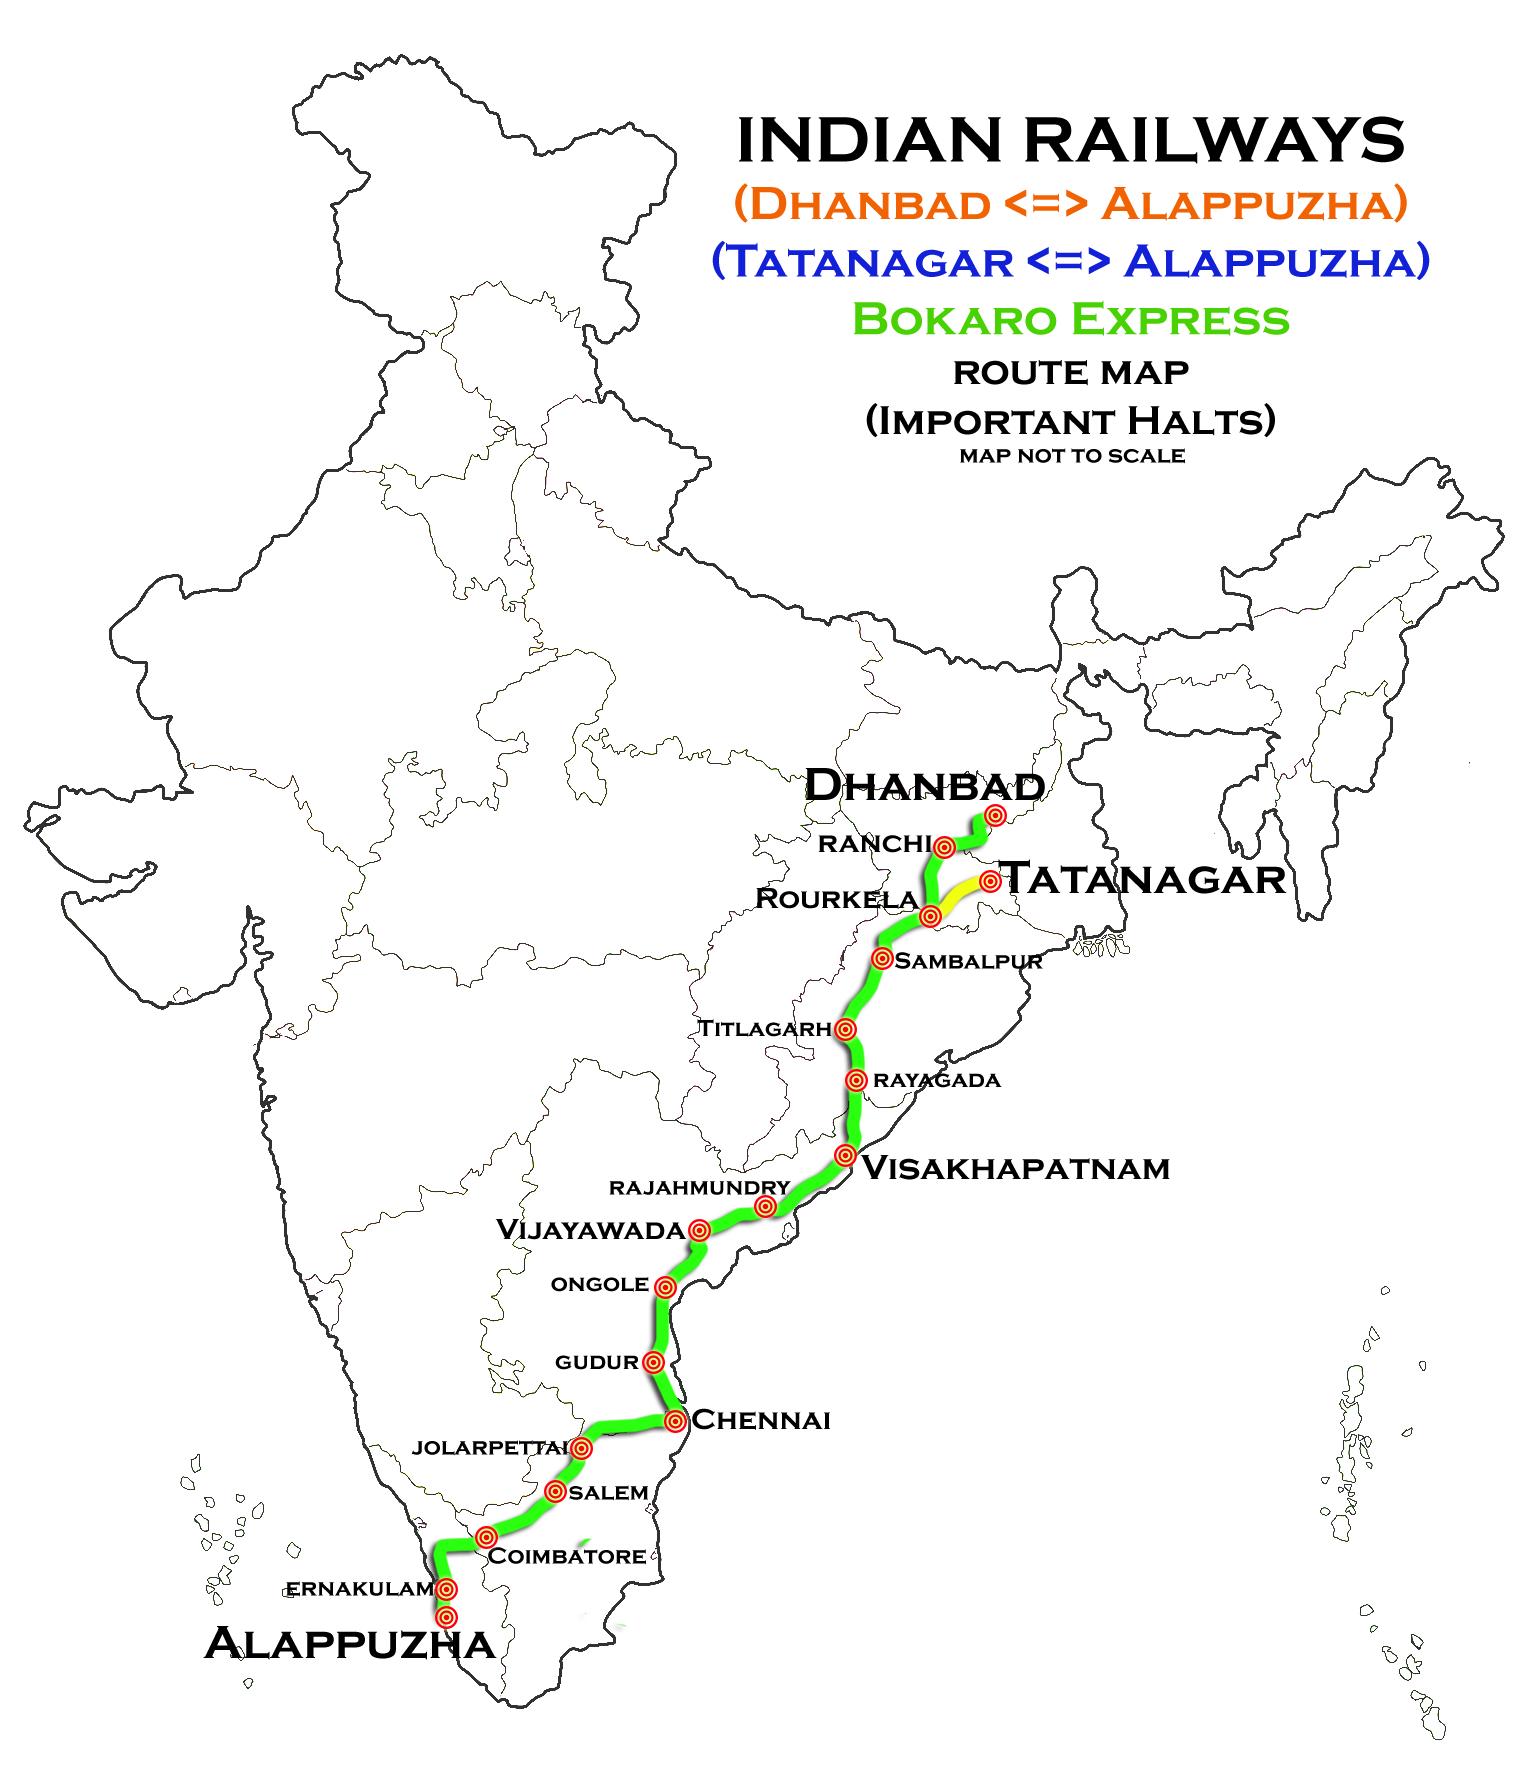 FileBokaro Express Dhanbad Alappuzha And Tatanagar - Dhanbad map